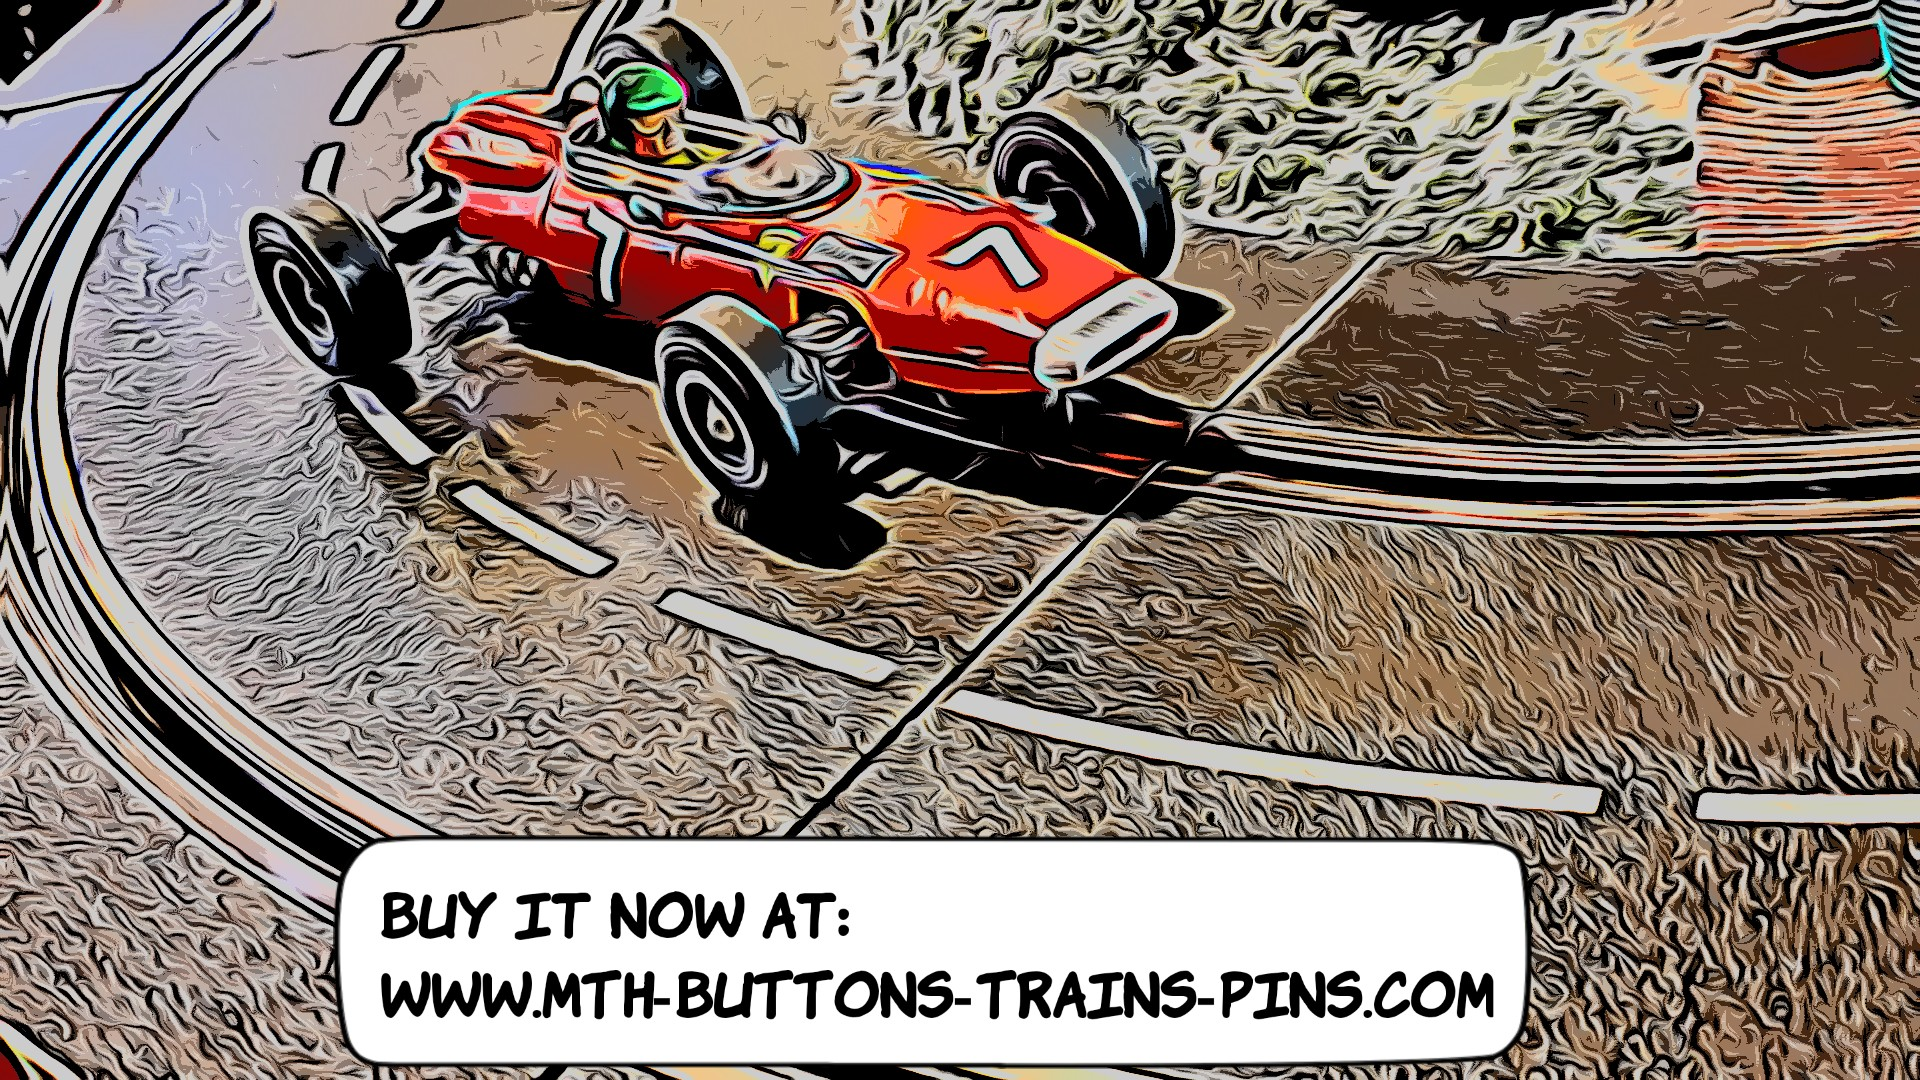 * SALE * COX 1964 Ferrari 158 F1 World Championship John Surtees & Lorenzo Bandini Slot Car 1:24 Scale